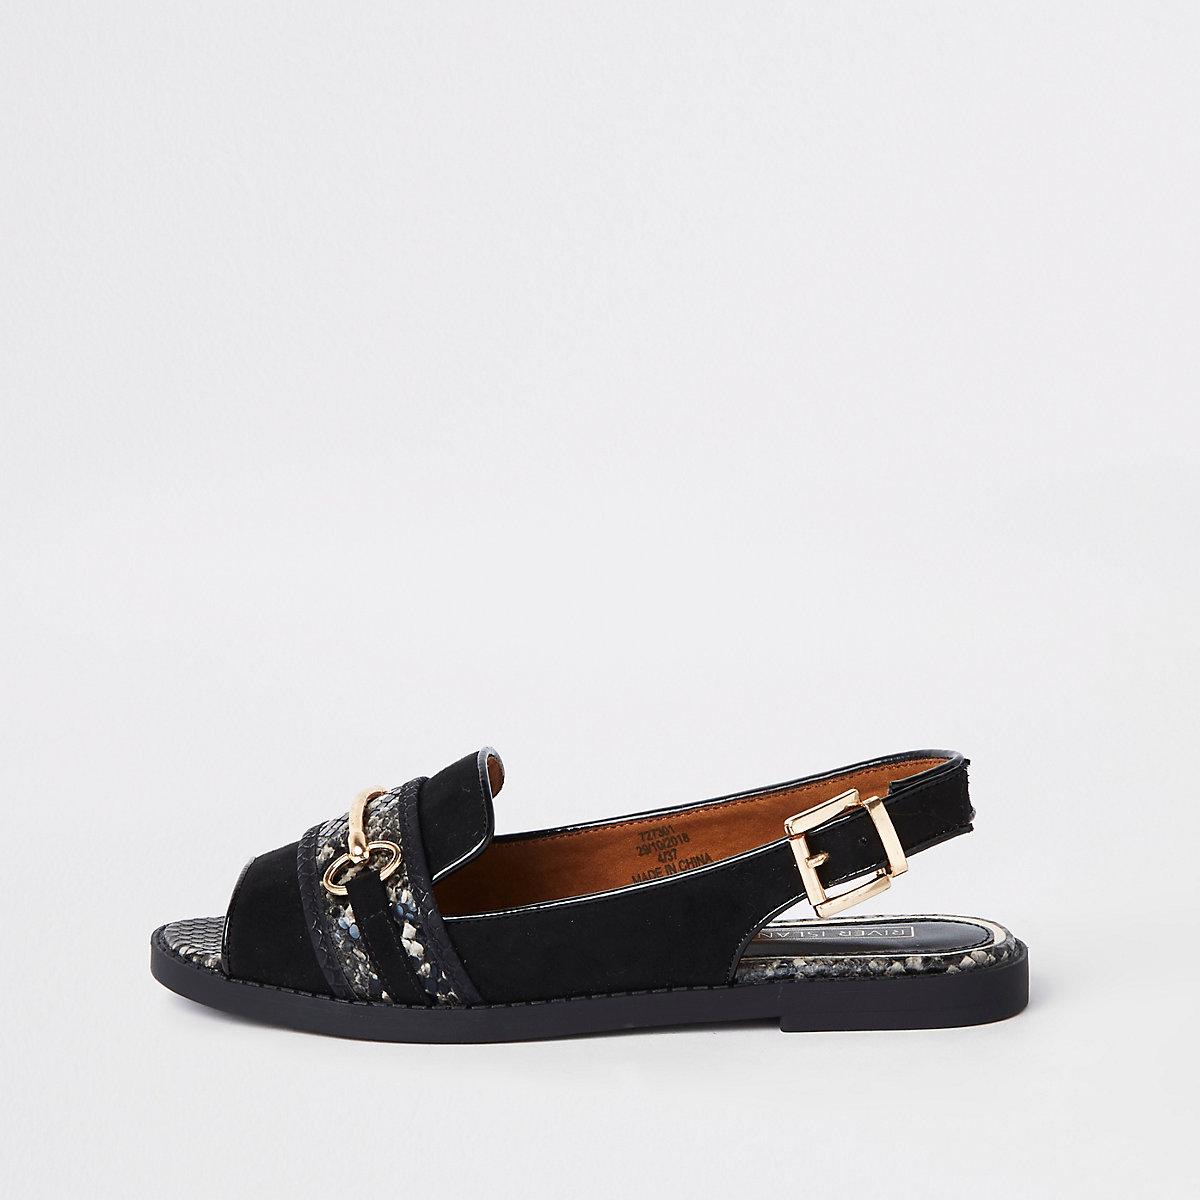 Black snake print slingback peep toe loafers